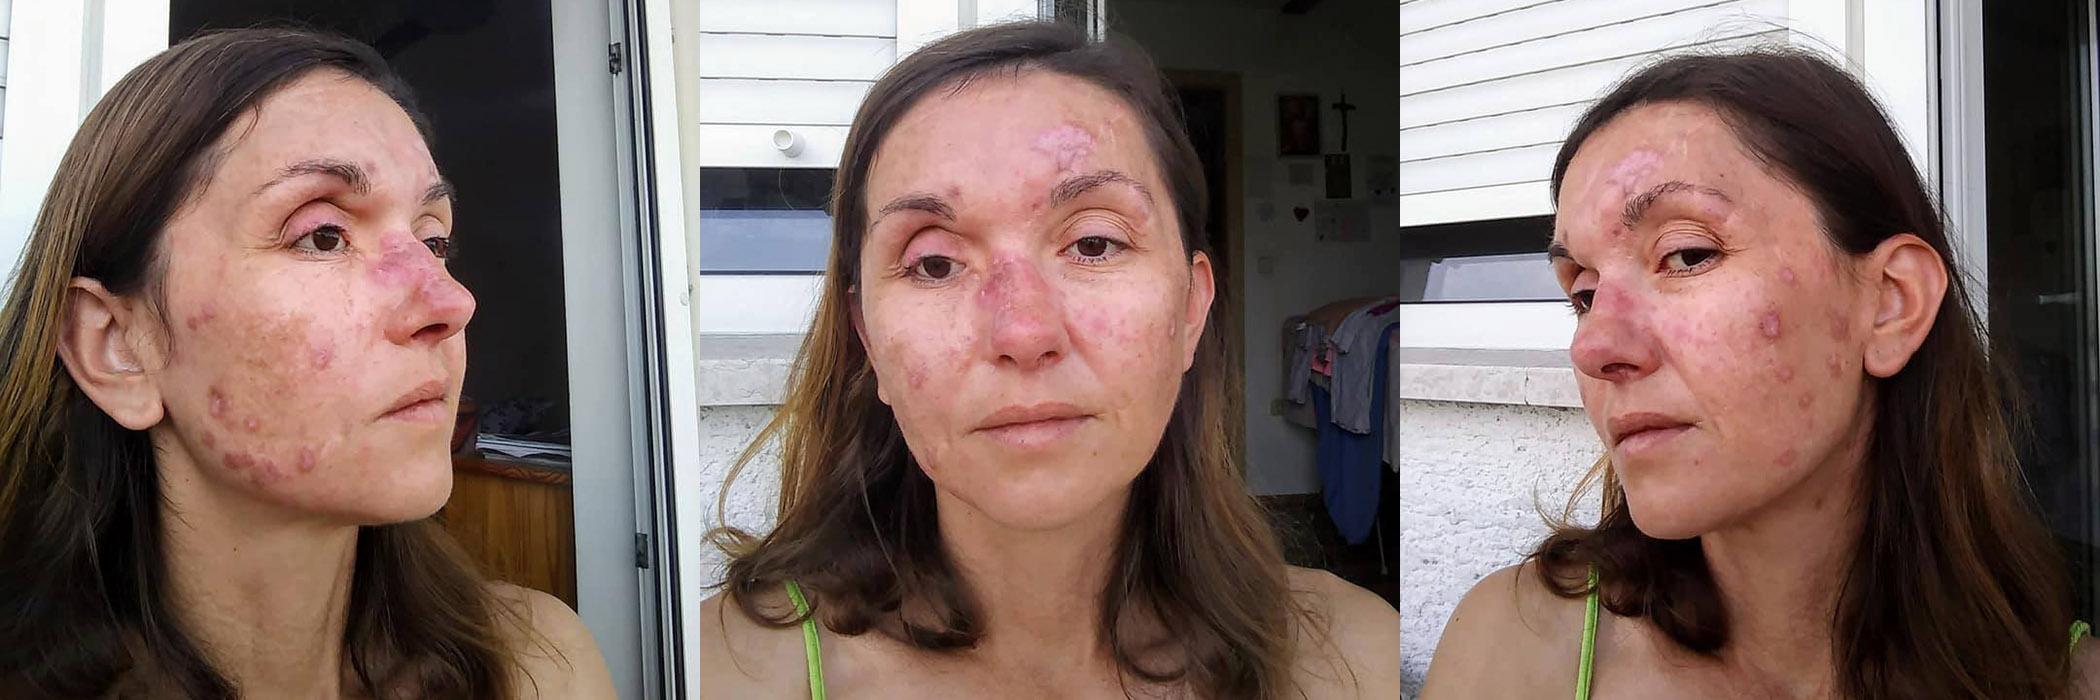 lezije lupus